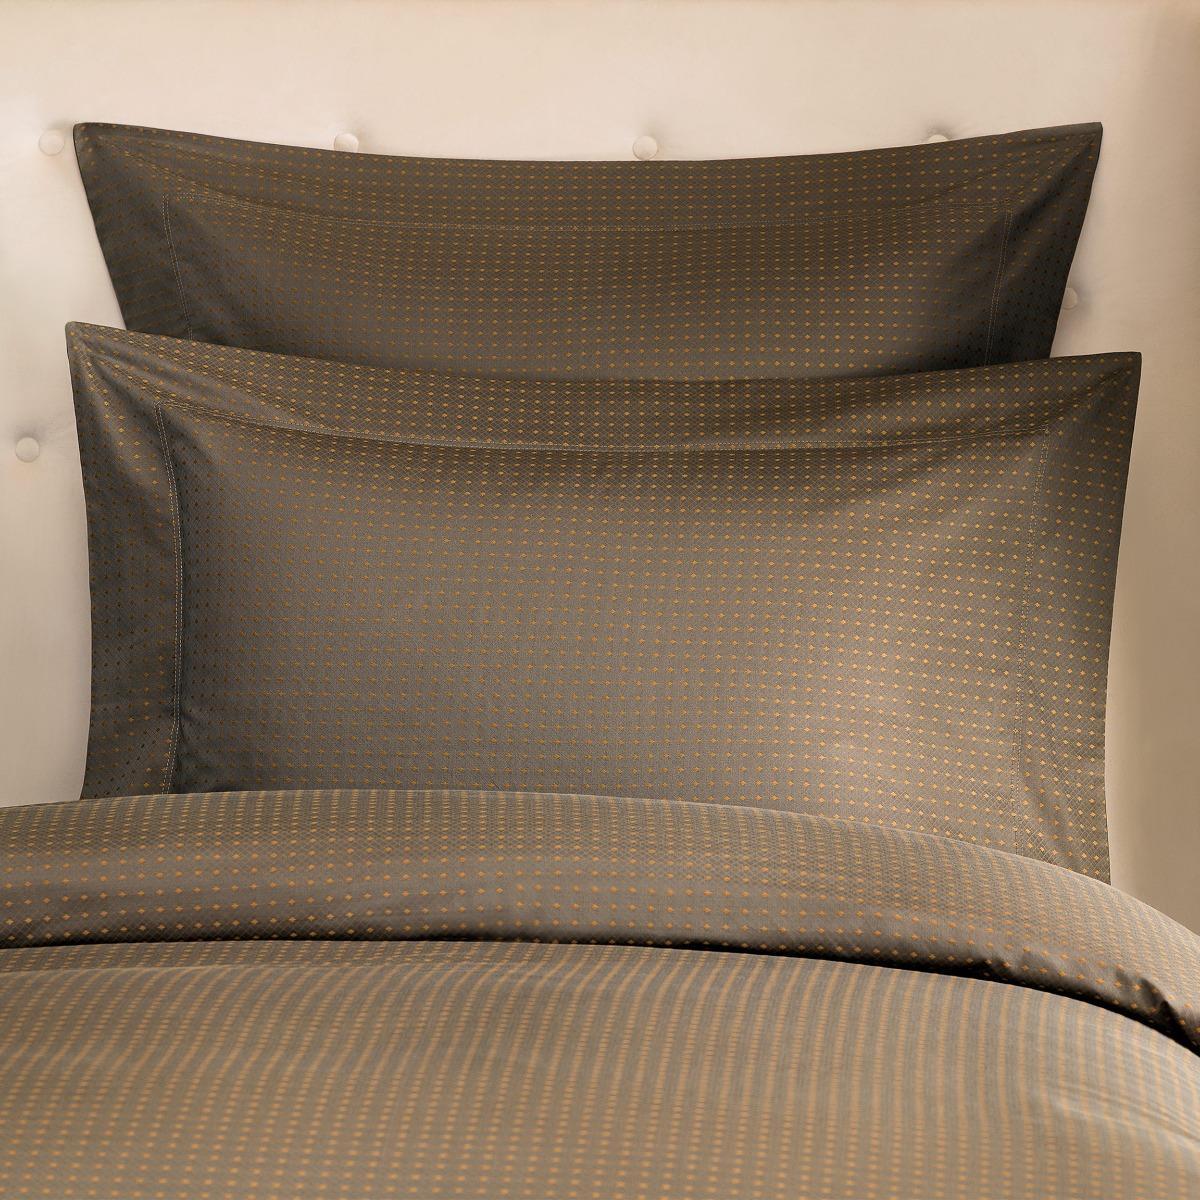 Комплект наволочек Togas Диксон серый 70х70. 2 пр комплект наволочек togas клэрити белый 70х70 2 пр